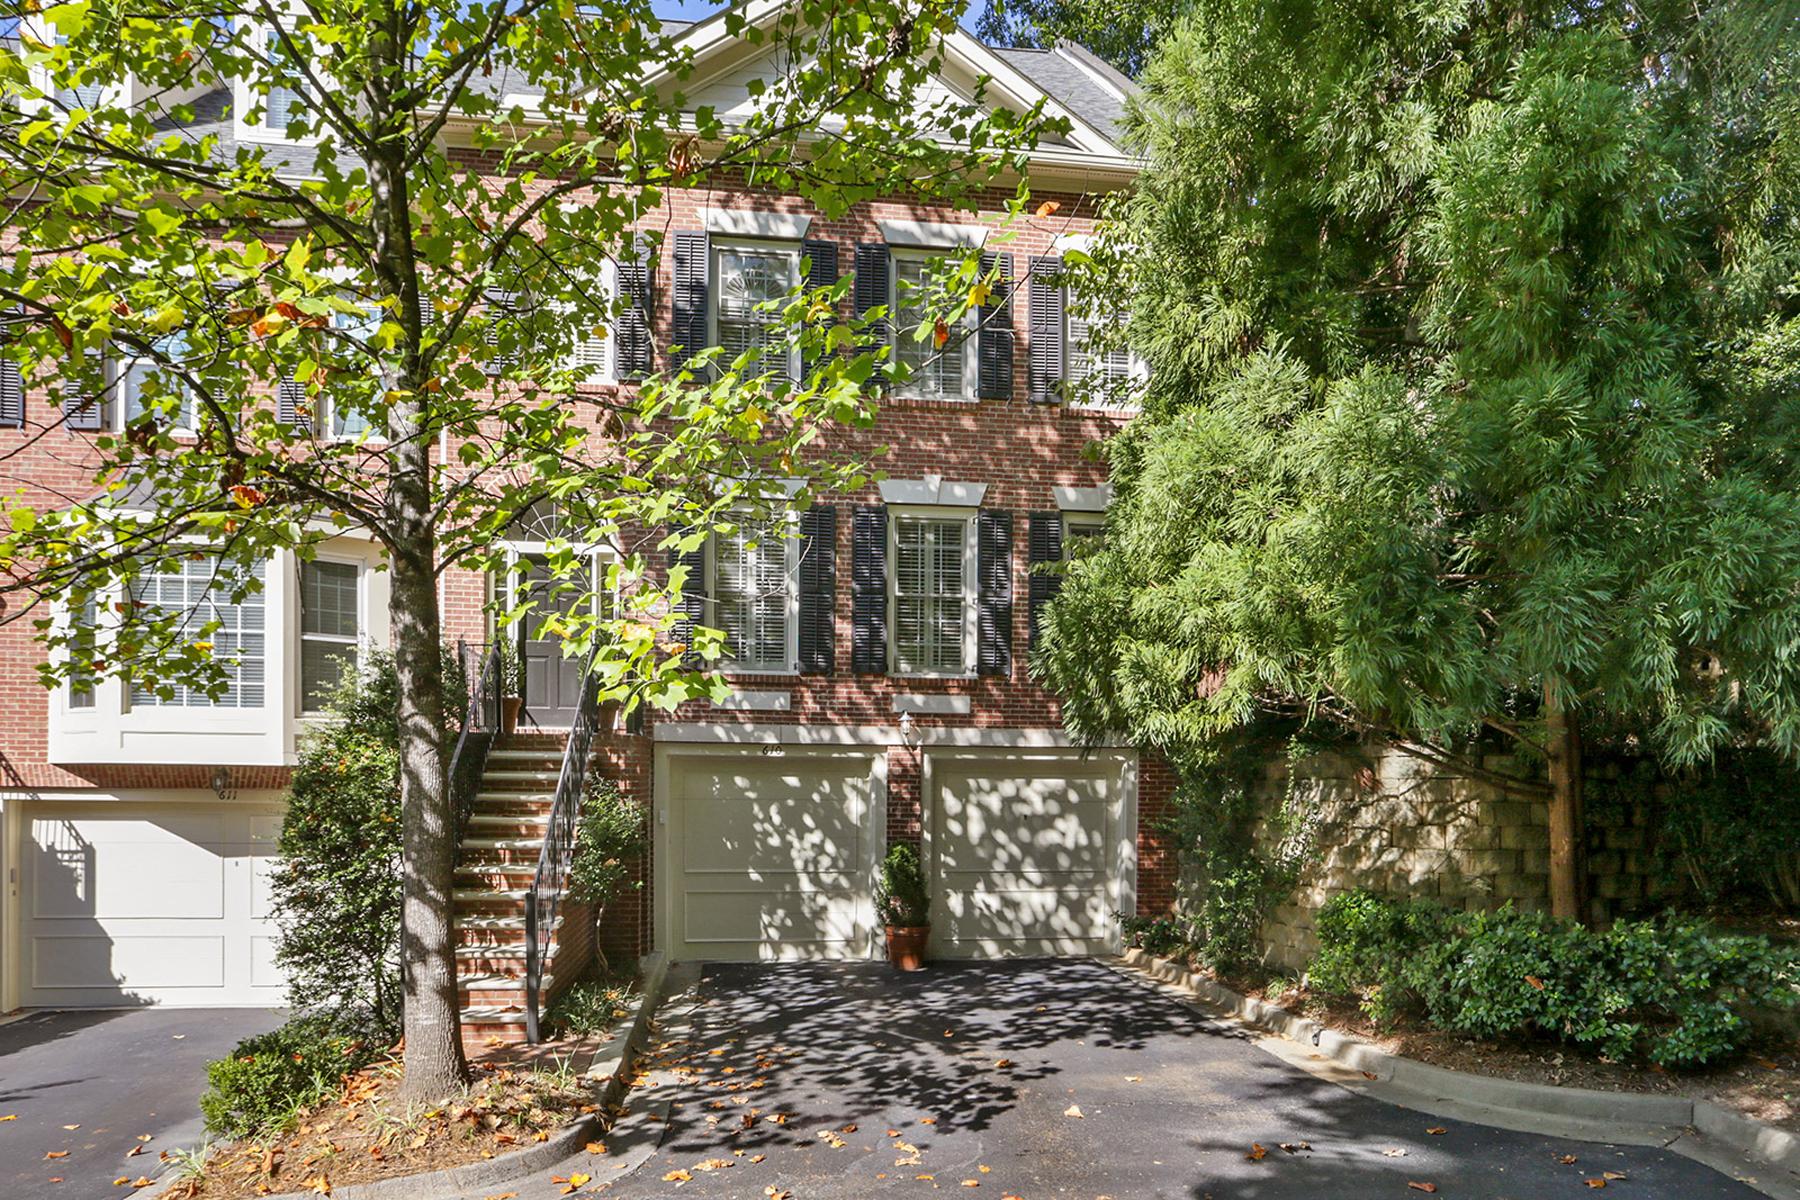 Property por un Venta en Townhome Perfection 1735 Peachtree Street NE No. 610, Atlanta, Georgia 30309 Estados Unidos